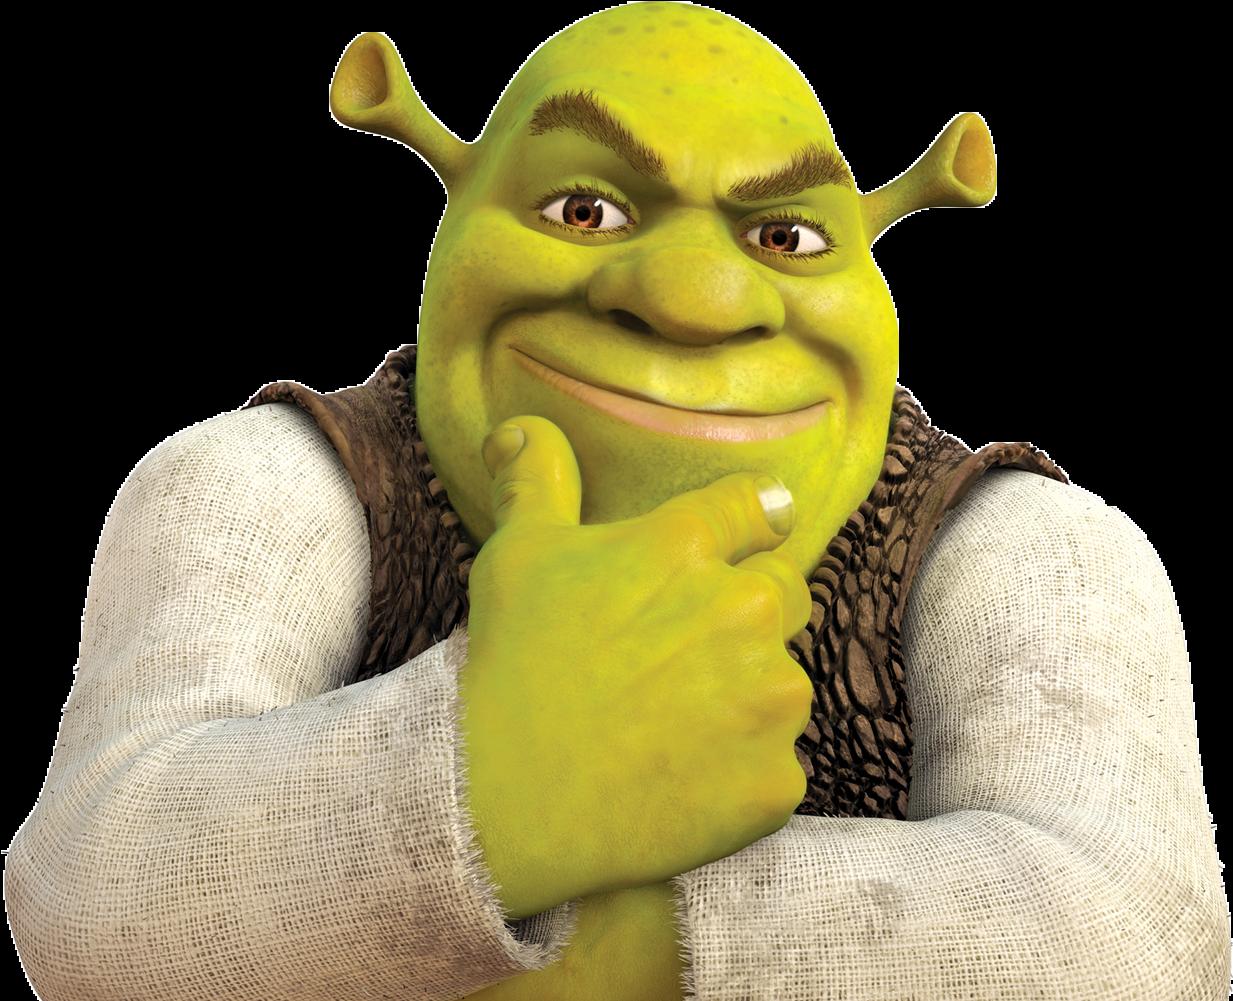 Shrek Thinking Close Up Face Close Up Faces Shrek Face